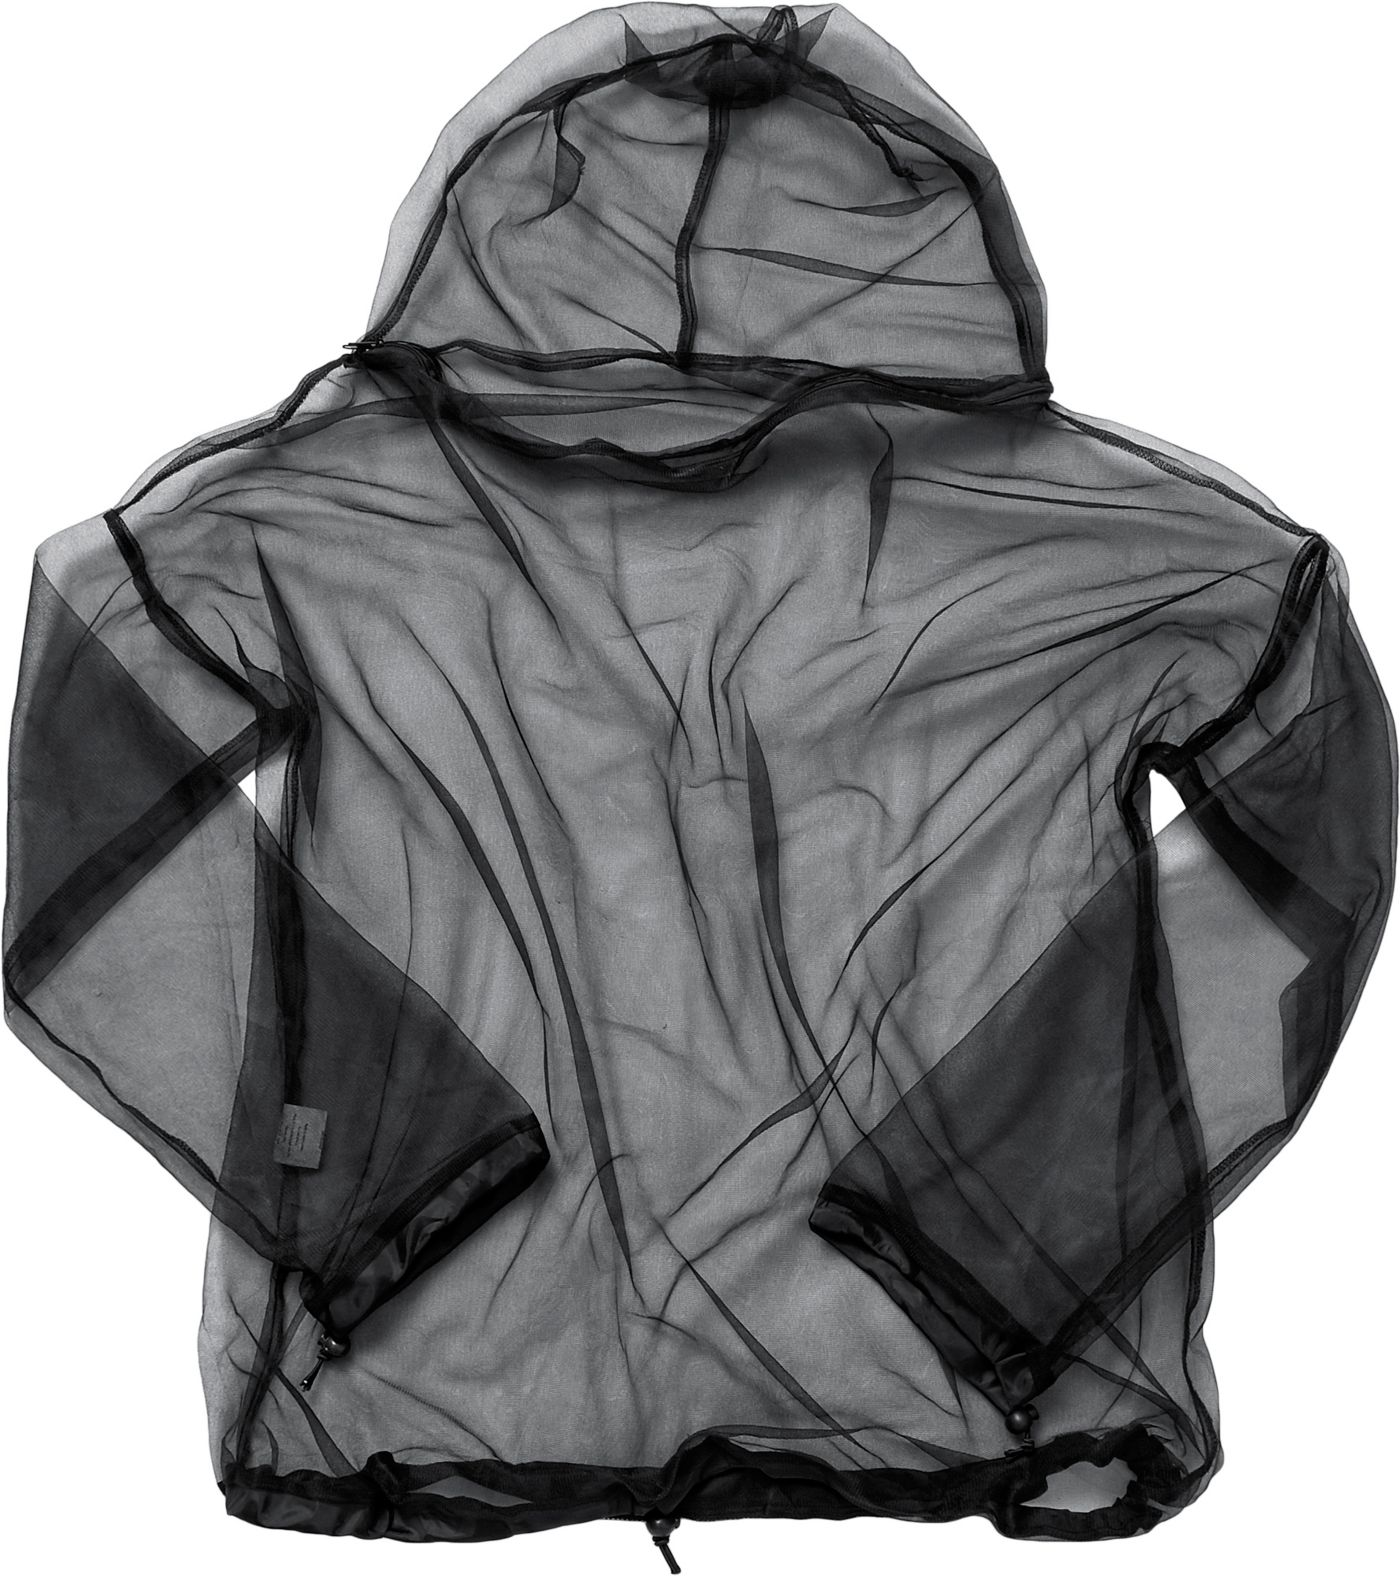 Field & Stream No-See-Um Suit L/XL